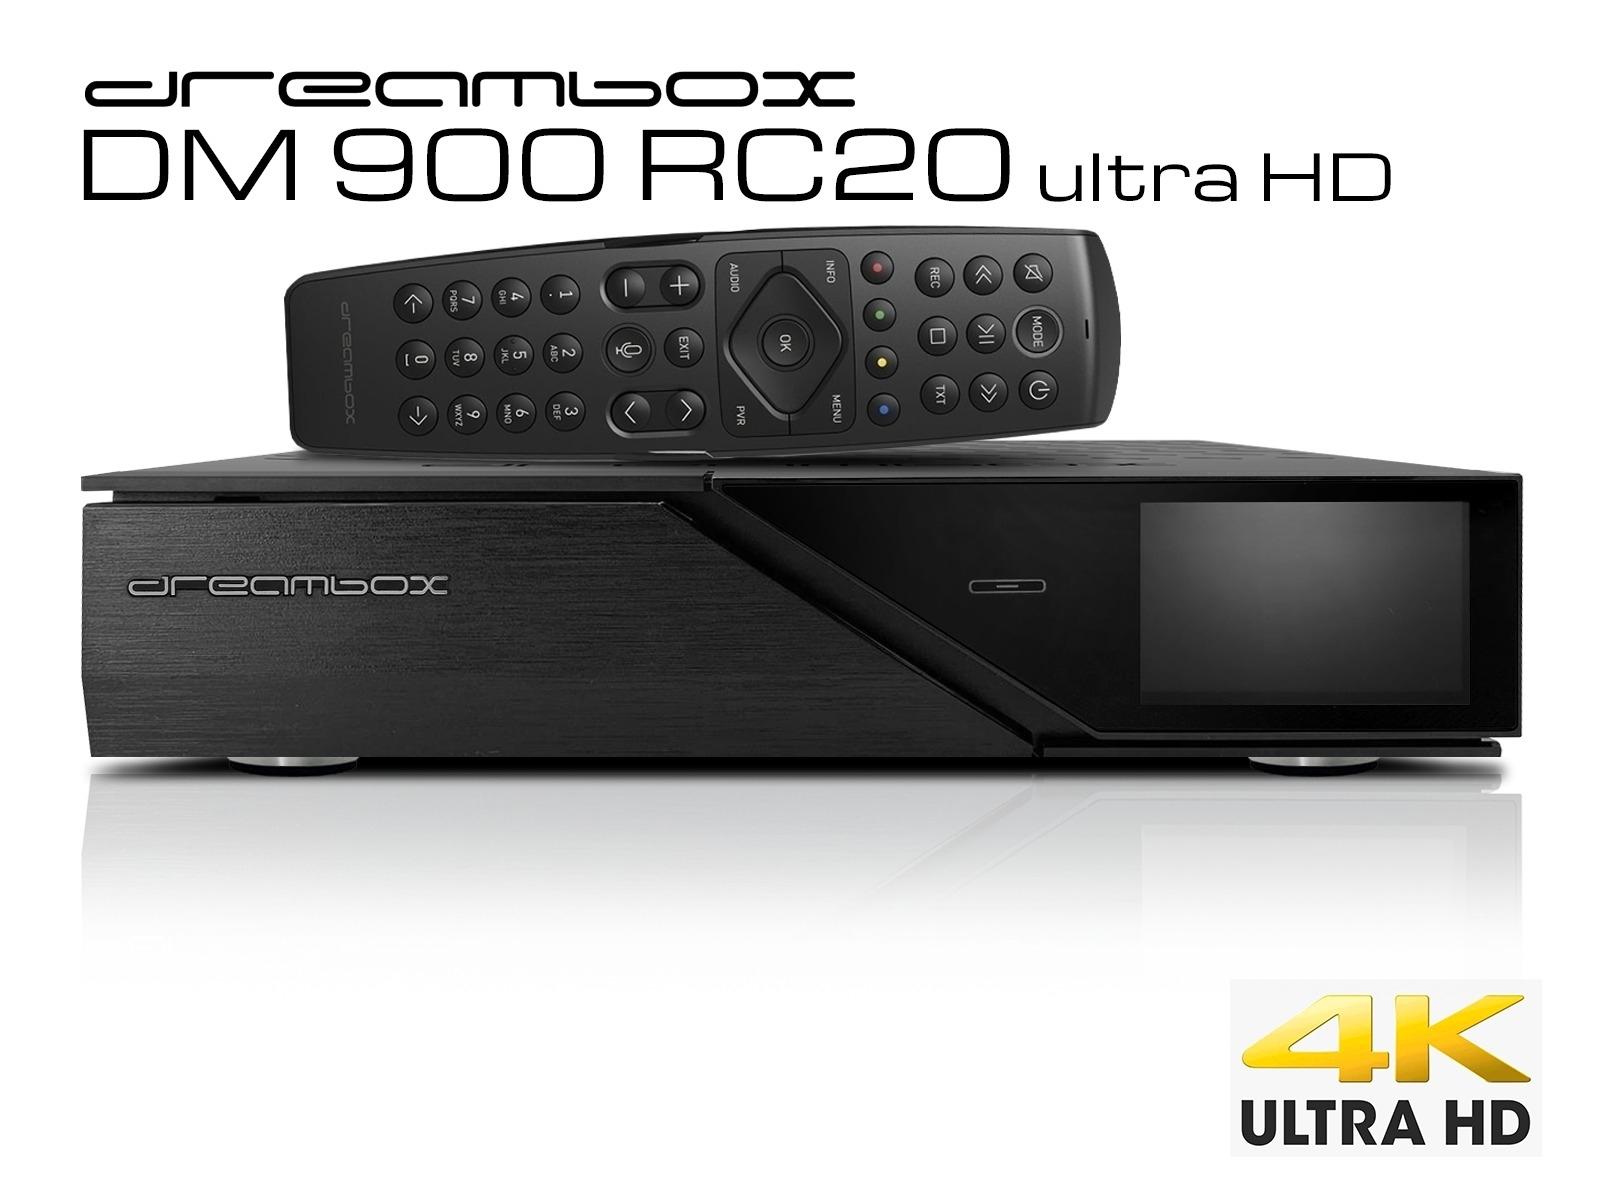 Dreambox DM900 RC20 UHD 4K 1x DVB-C FBC Tuner E2 Linux PVR ready Receiver